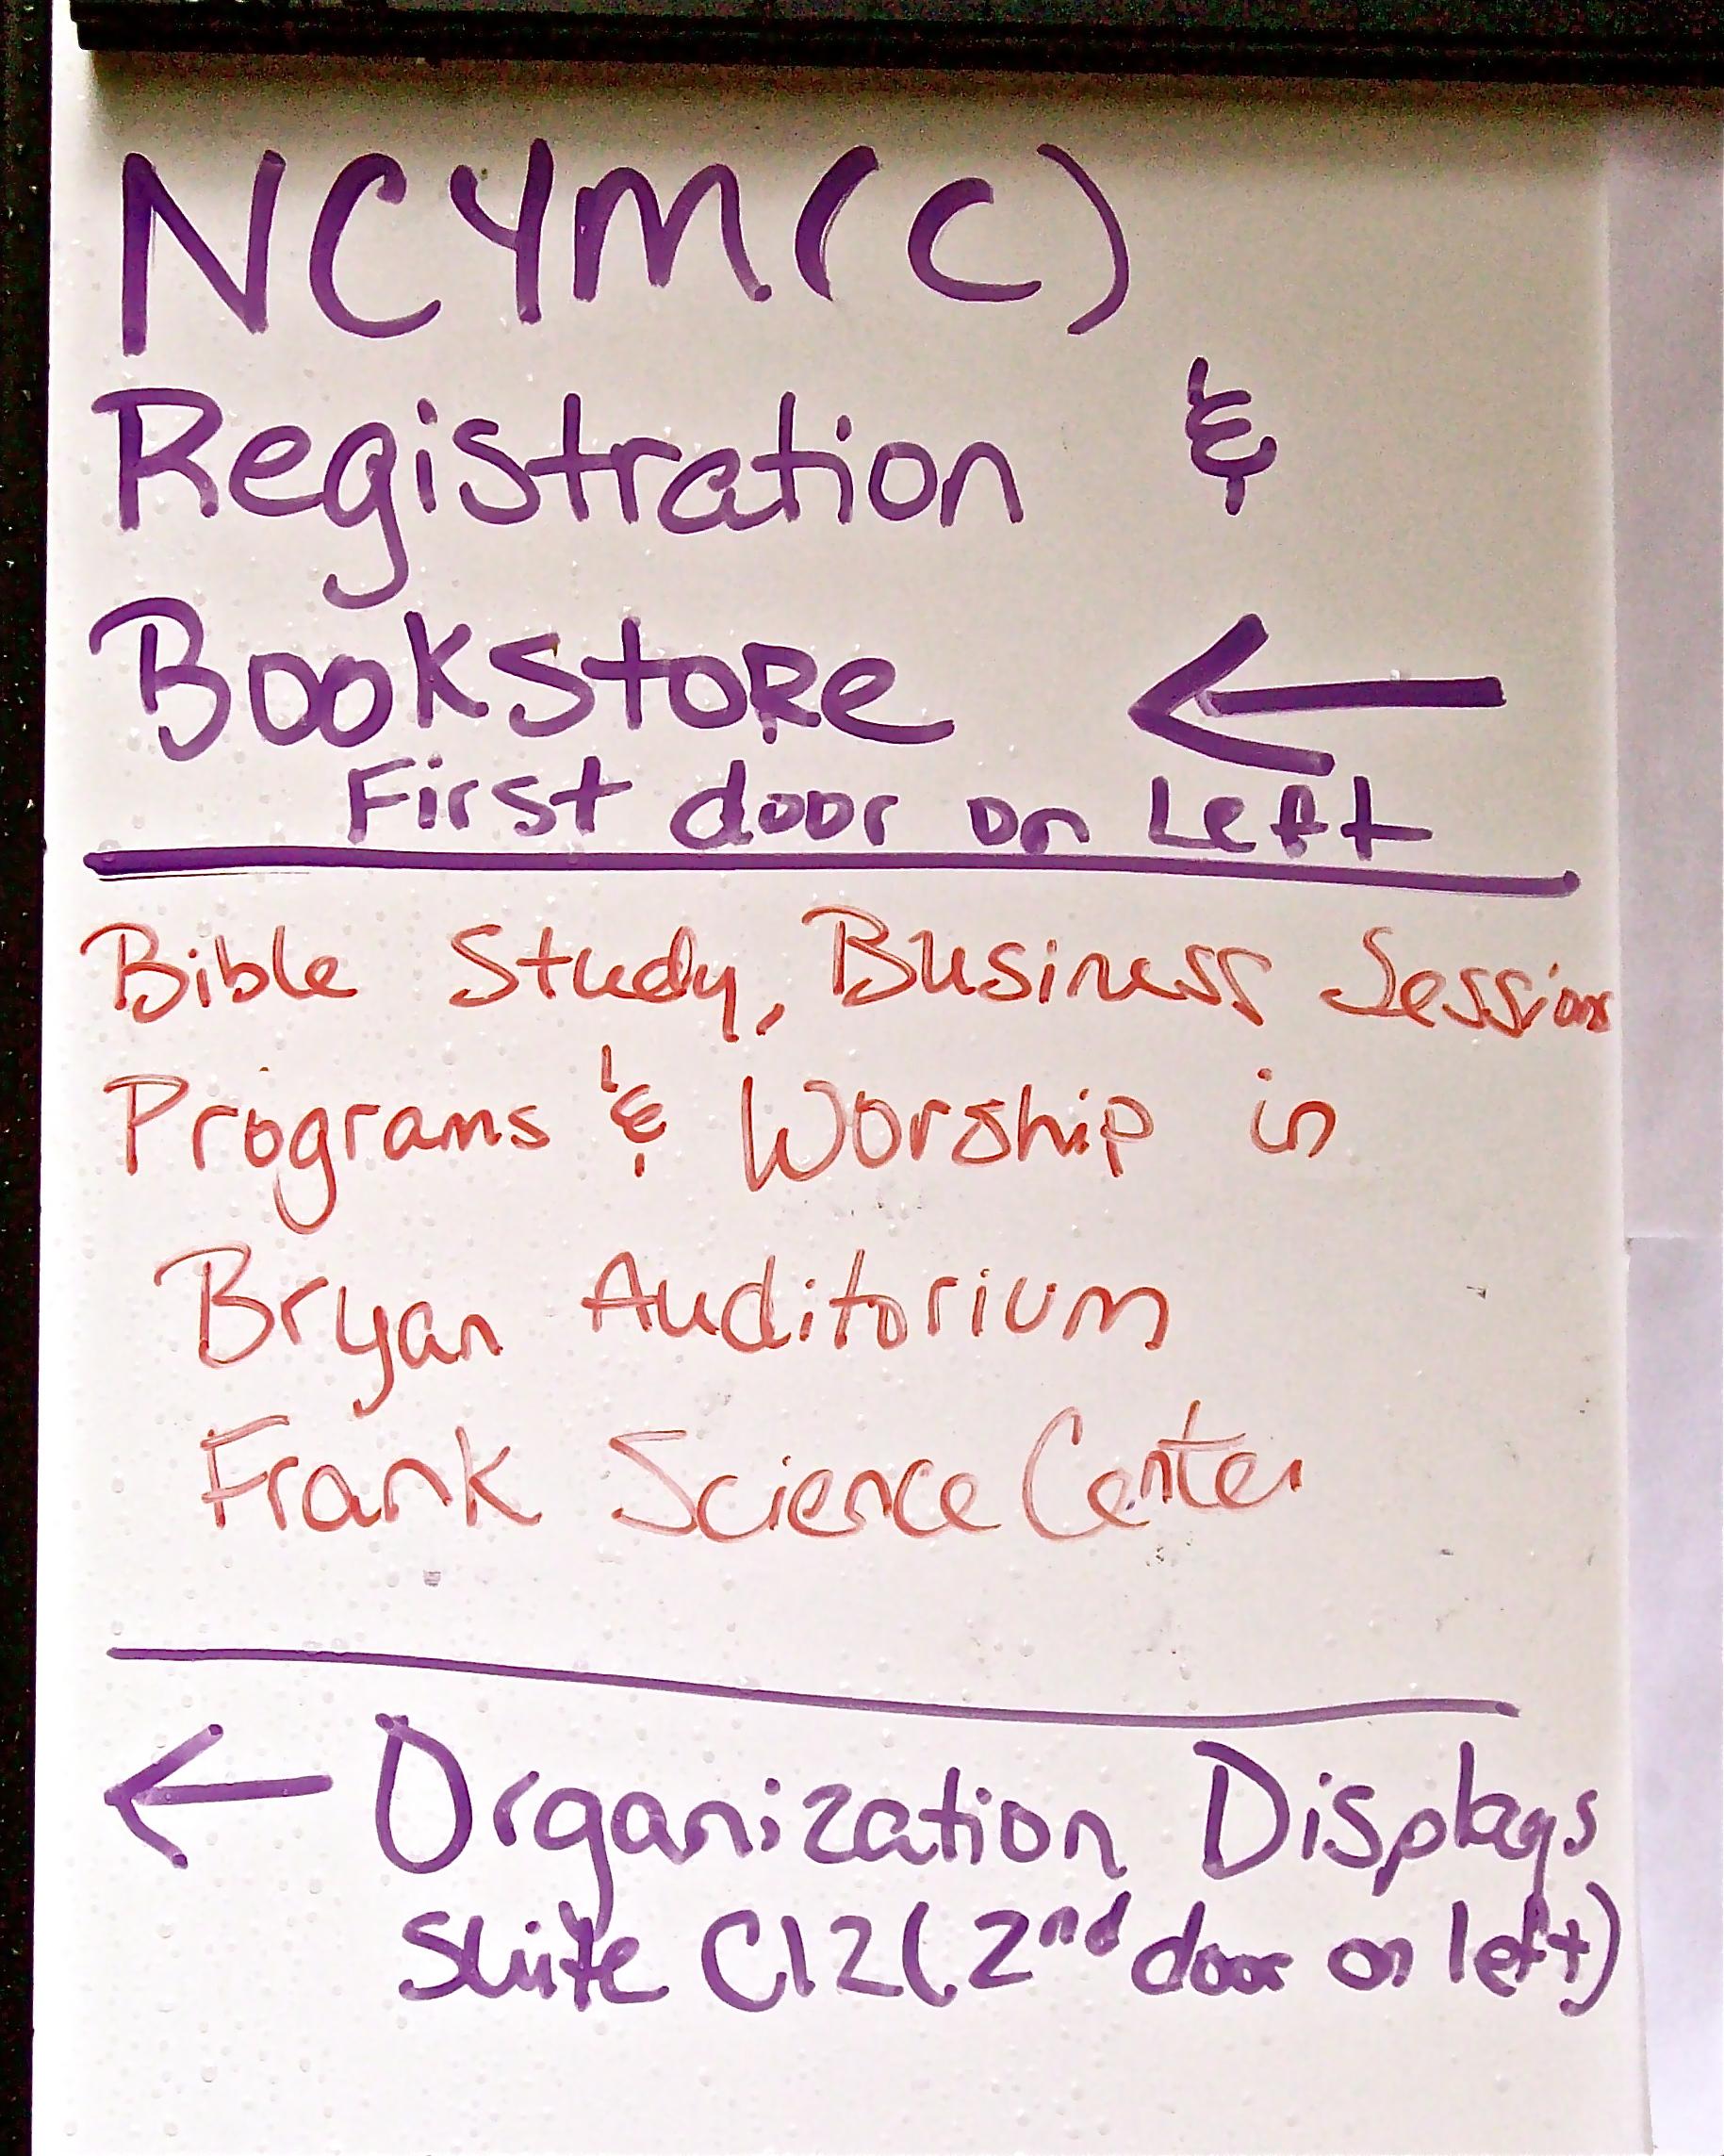 NCYM-C Sign